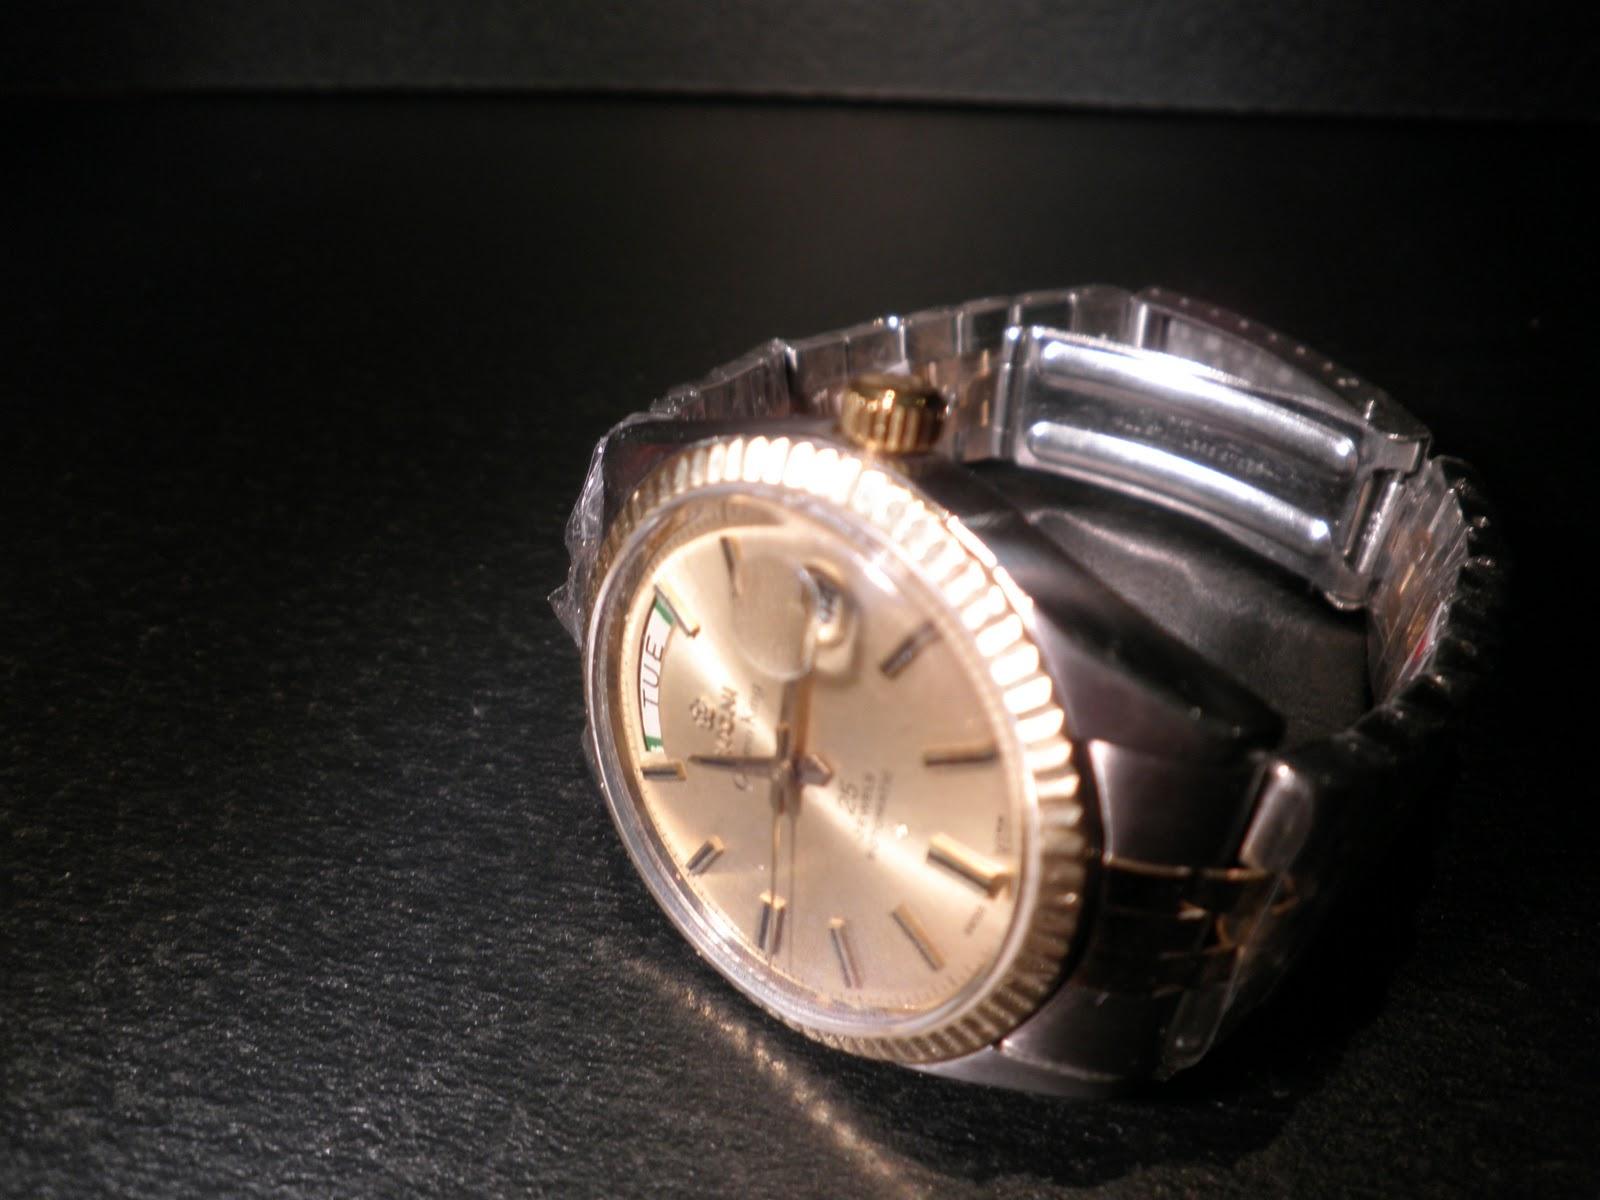 eta 2834 2 manual-winding chronograph movement